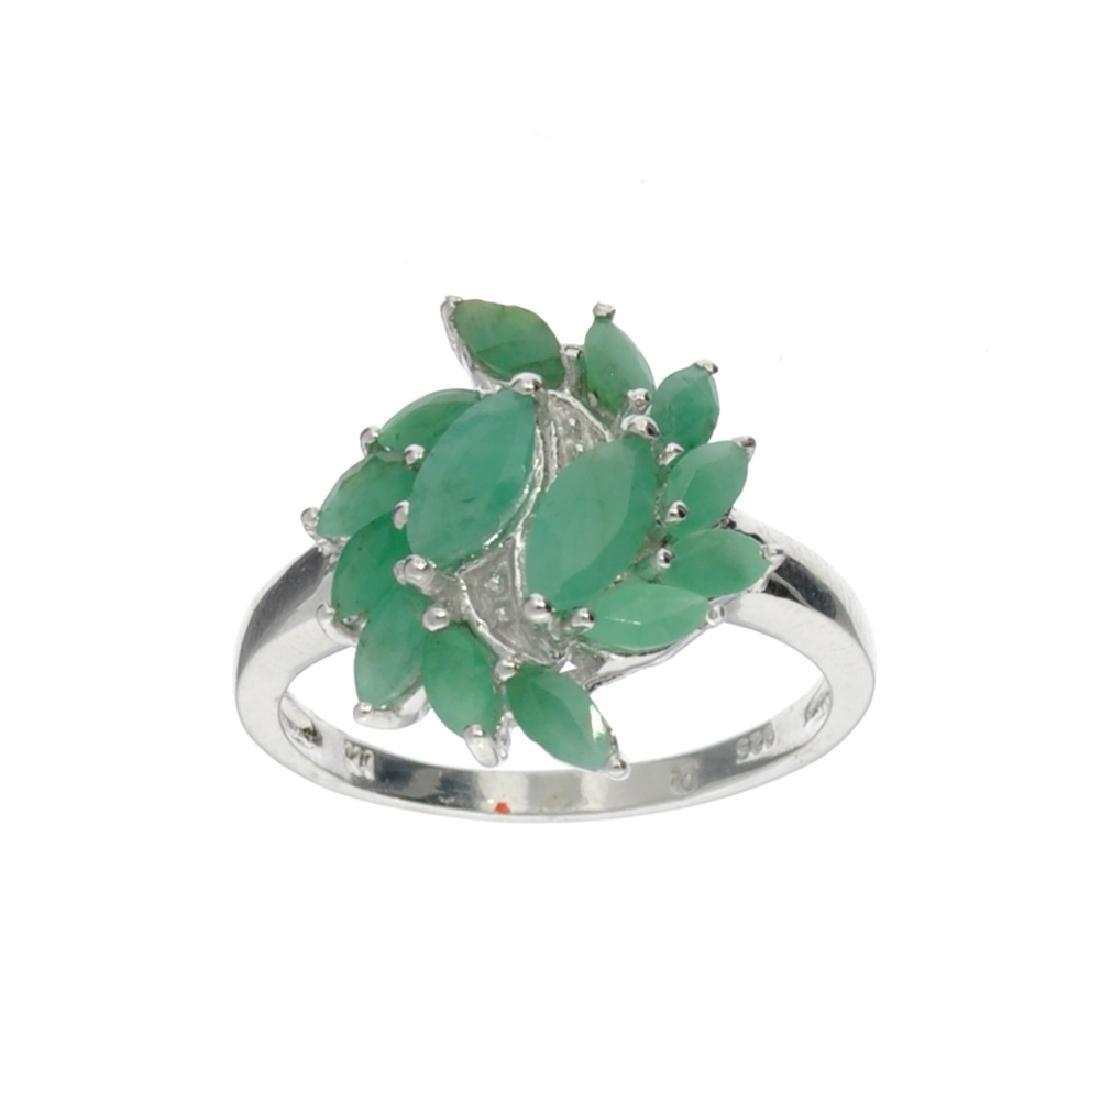 APP: 0.5k Fine Jewelry 0.96CT Marquise Cut Green